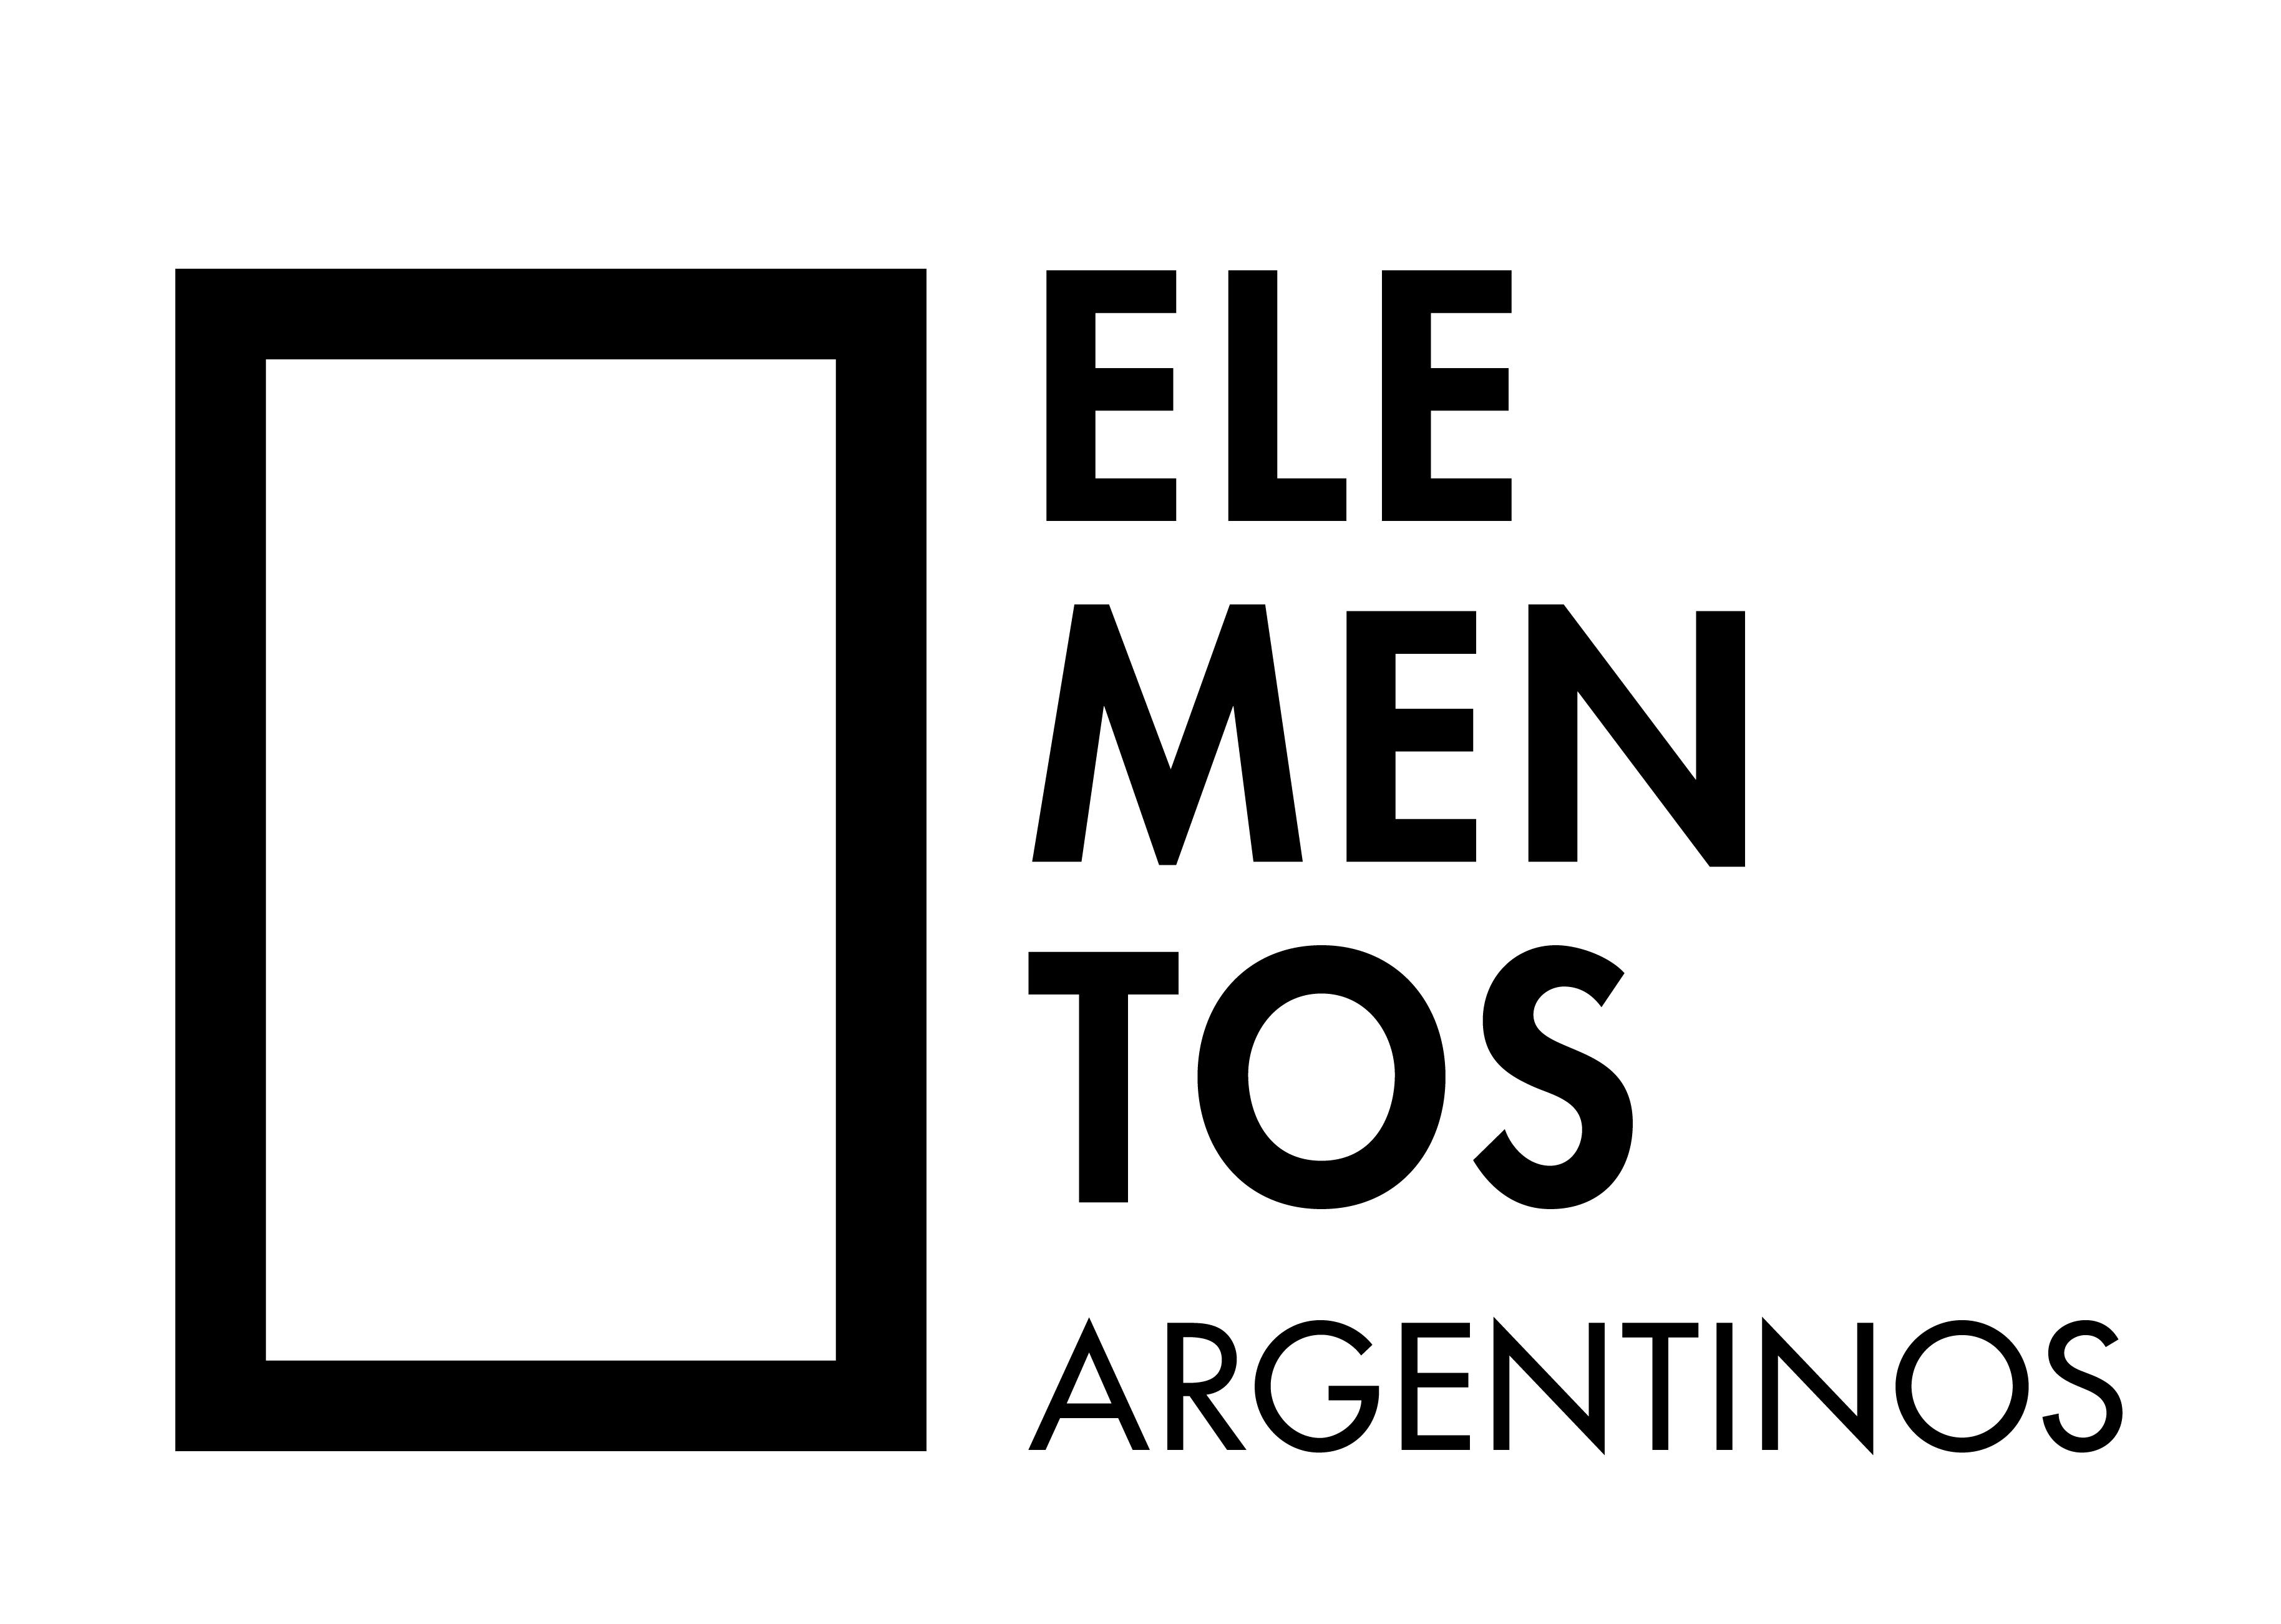 Logo for Elementos Argentinos